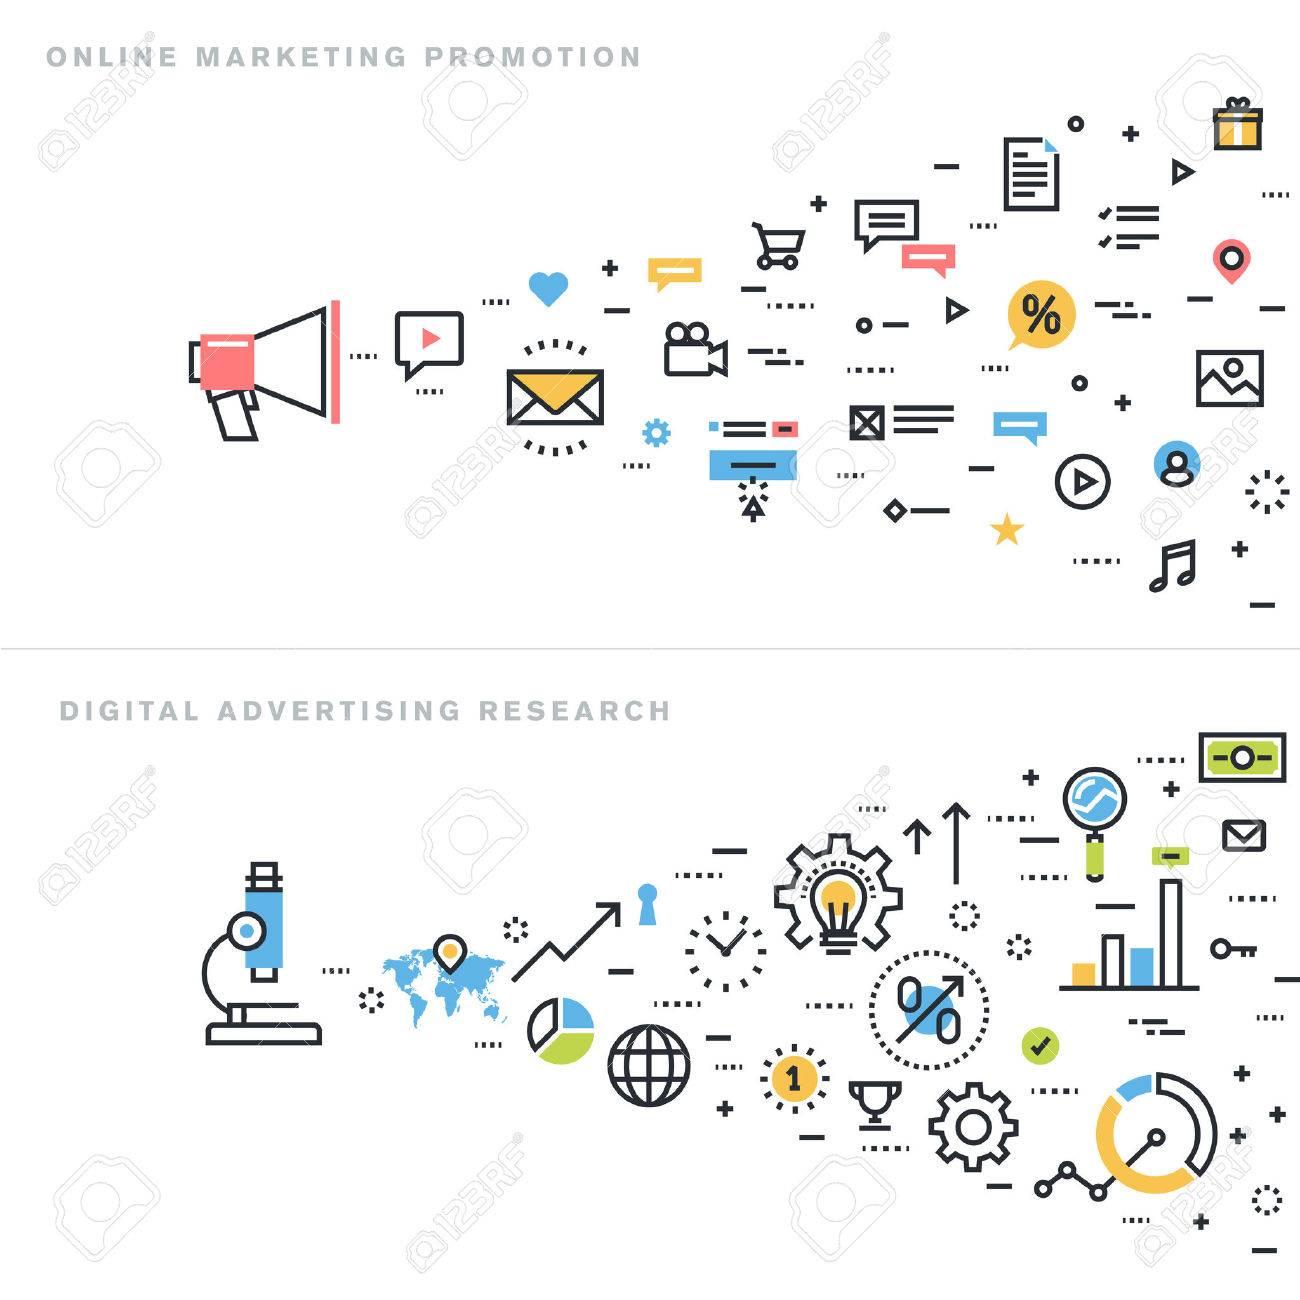 Flat line design vector illustration concepts for online marketing promotion, digital advertising research, market research, internet marketing, e-commerce, for website banner and landing page. Stock Vector - 47893160